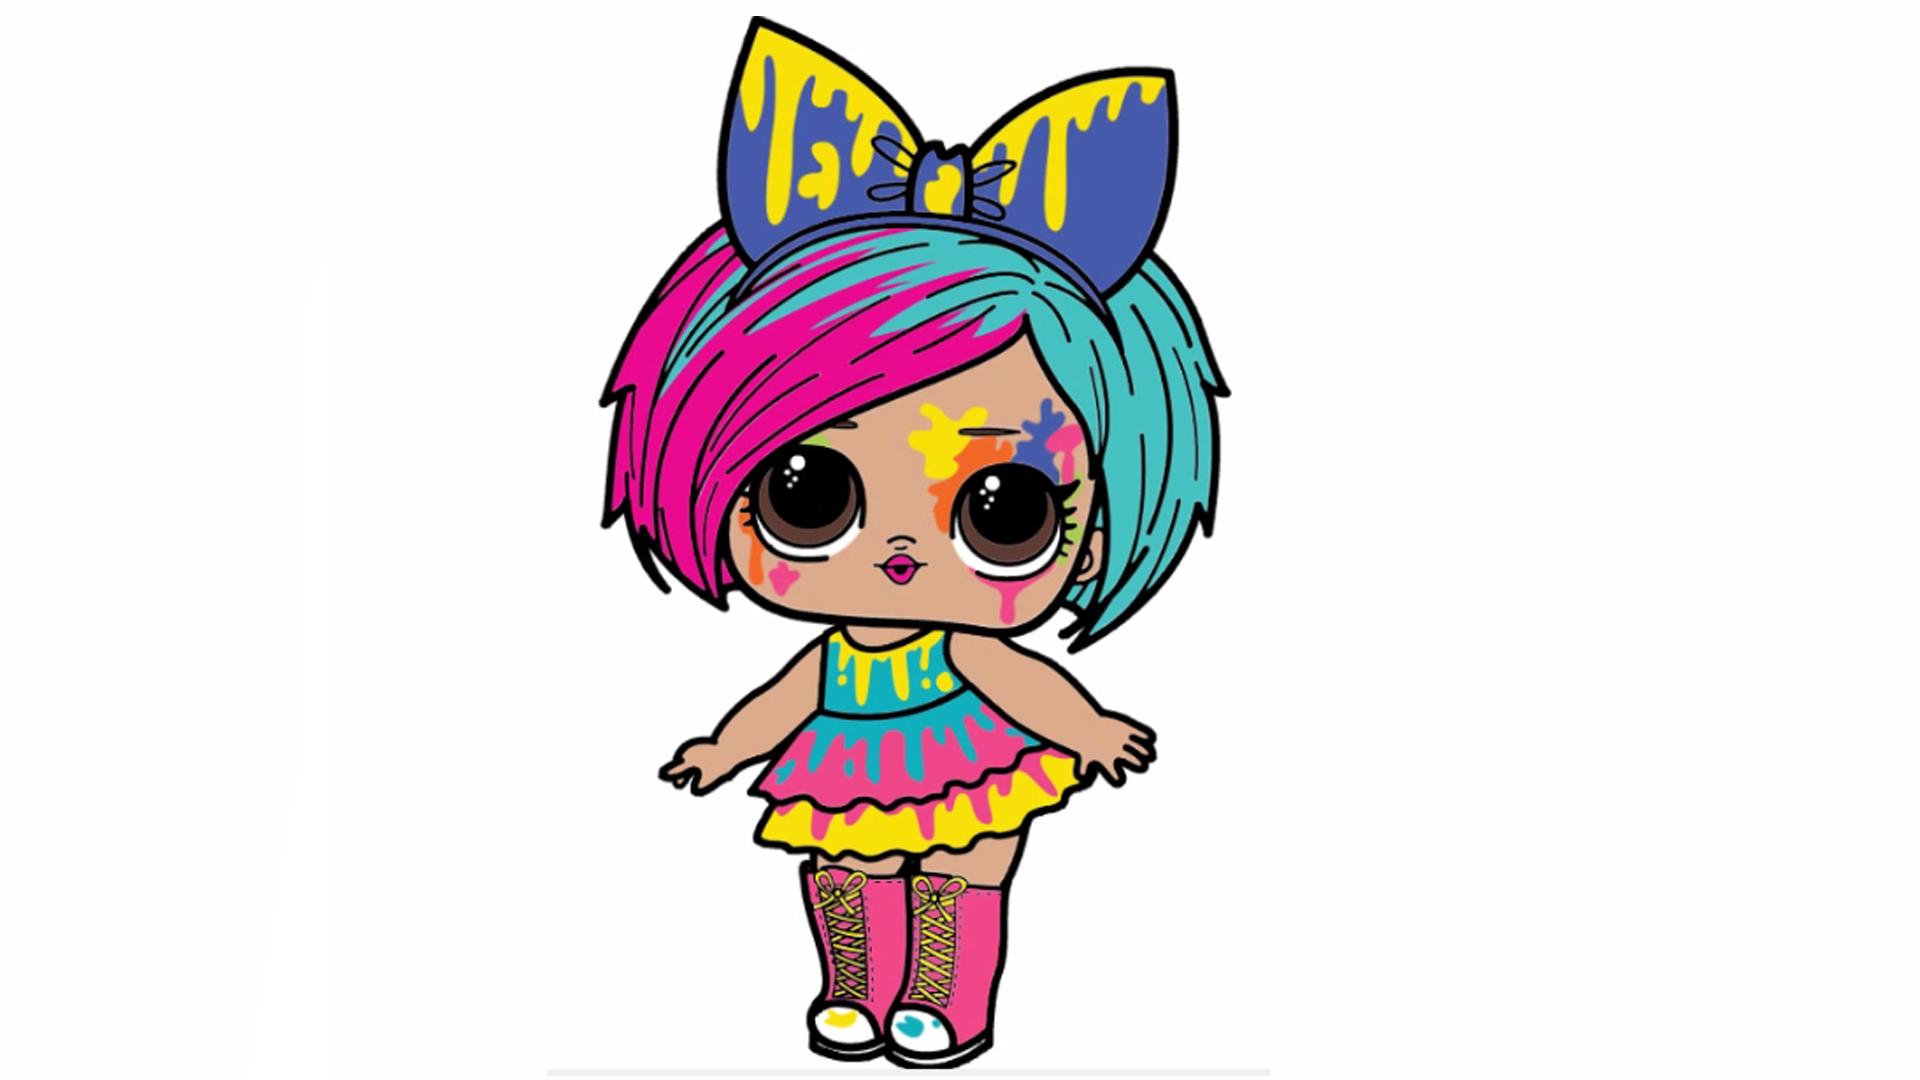 Splatters Lol Surprise Dolls Lol Dolls Doll Drawing Cute Dolls